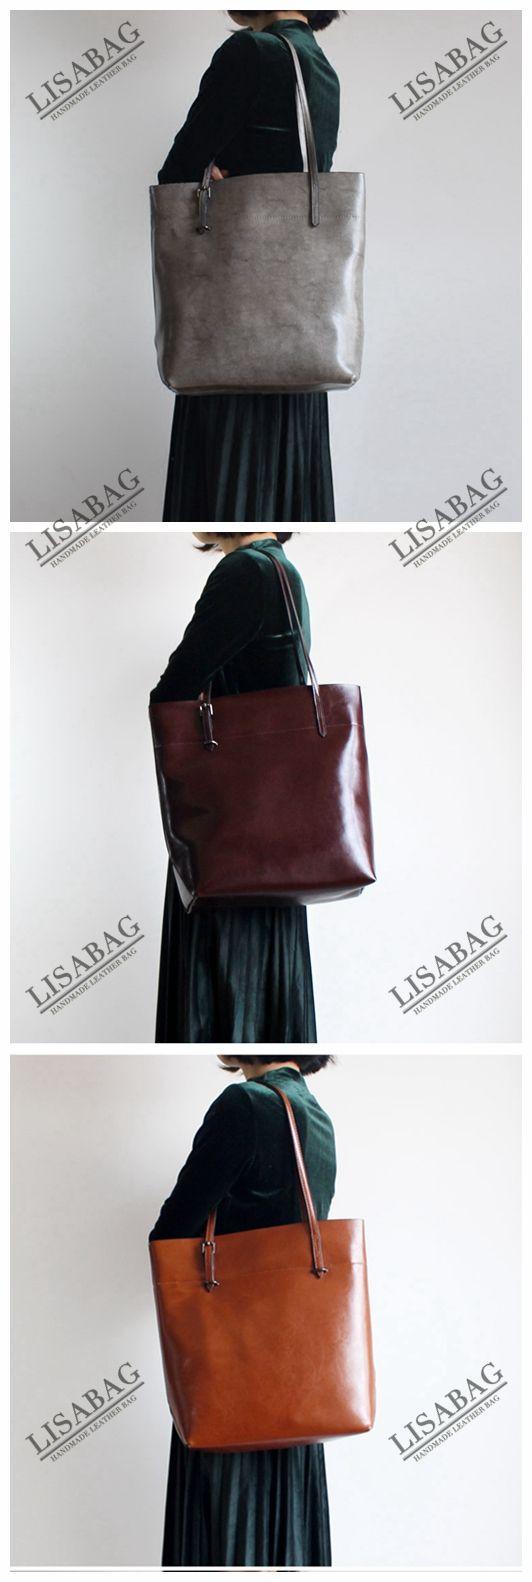 Handmade Women s Fashion Leather Tote Bag Handbag Shoulder Bag Shopper Bag  in Red 14149 - Red   Bag, Purse and Fashion bags de512e1661